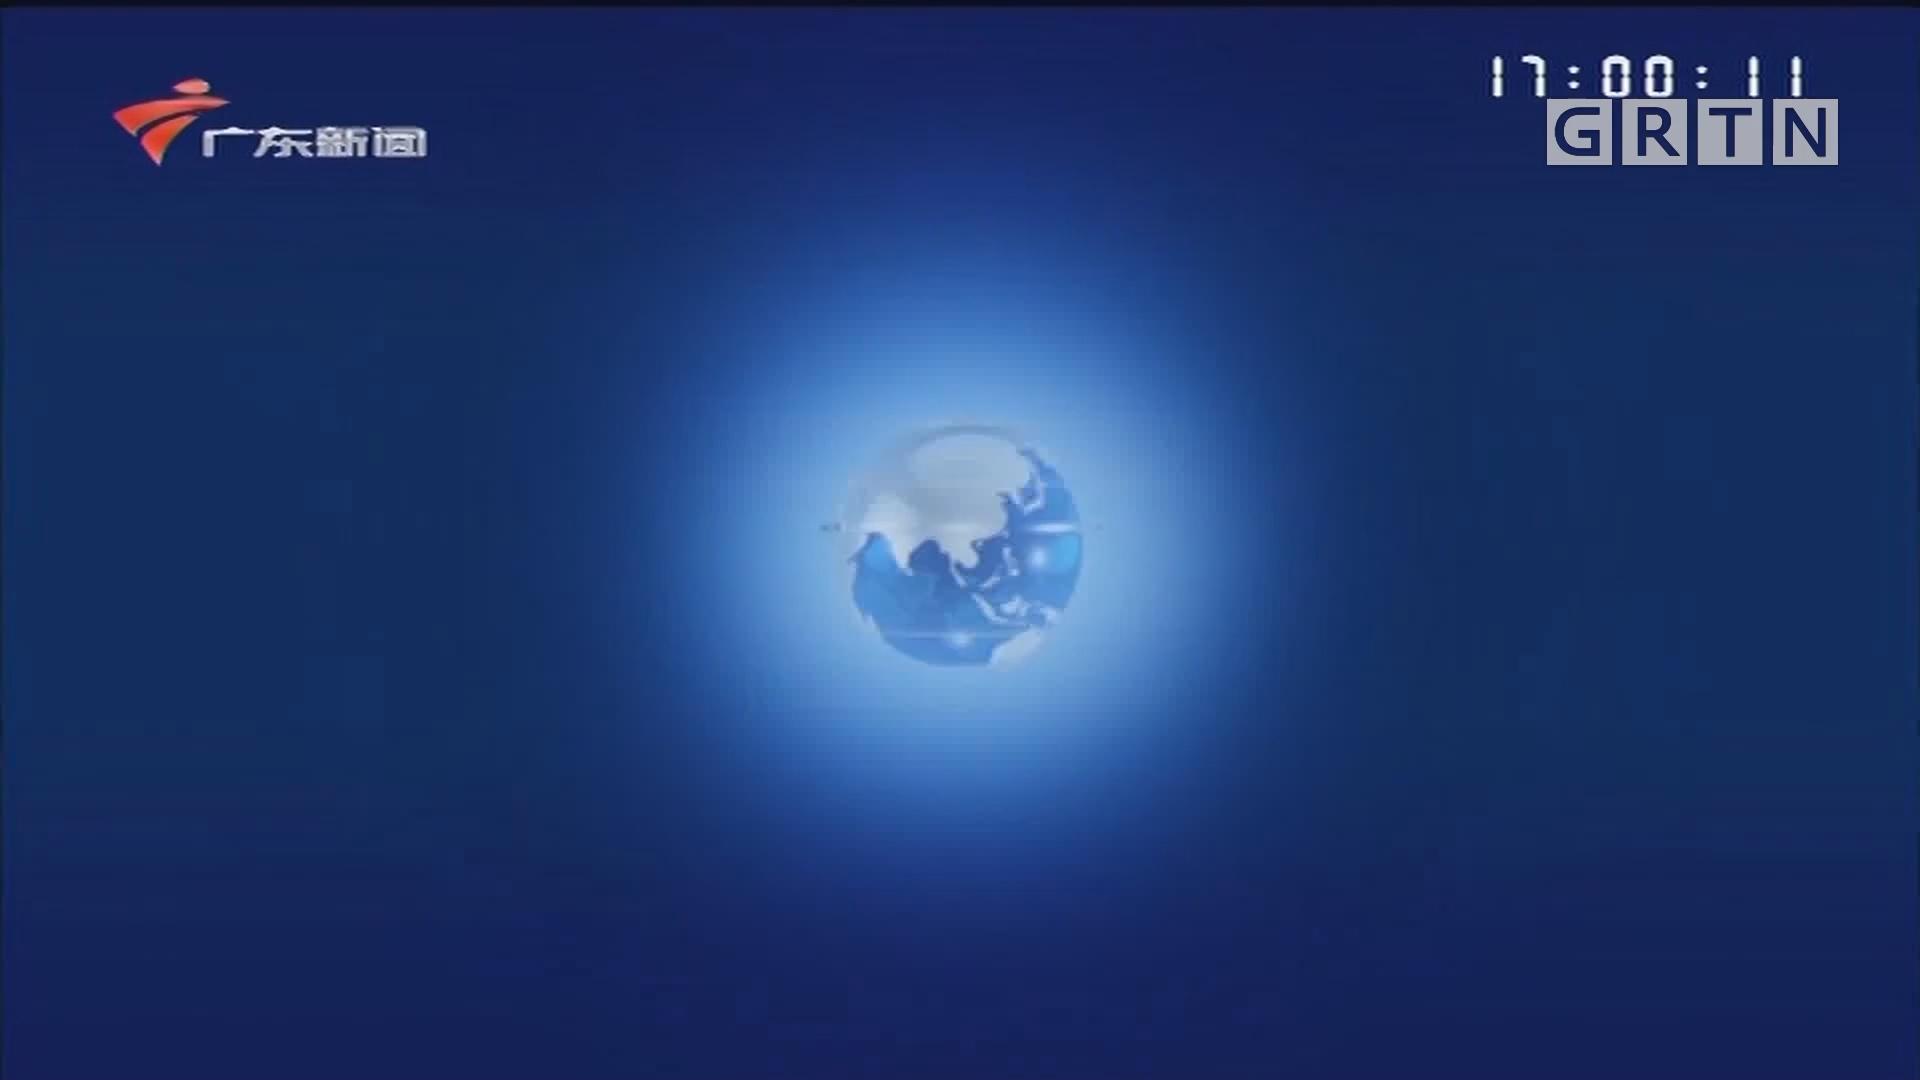 [HD][2020-01-01-17:00]正點播報:央行決定1月6日下調金融機構存款準備金率0.5個百分點